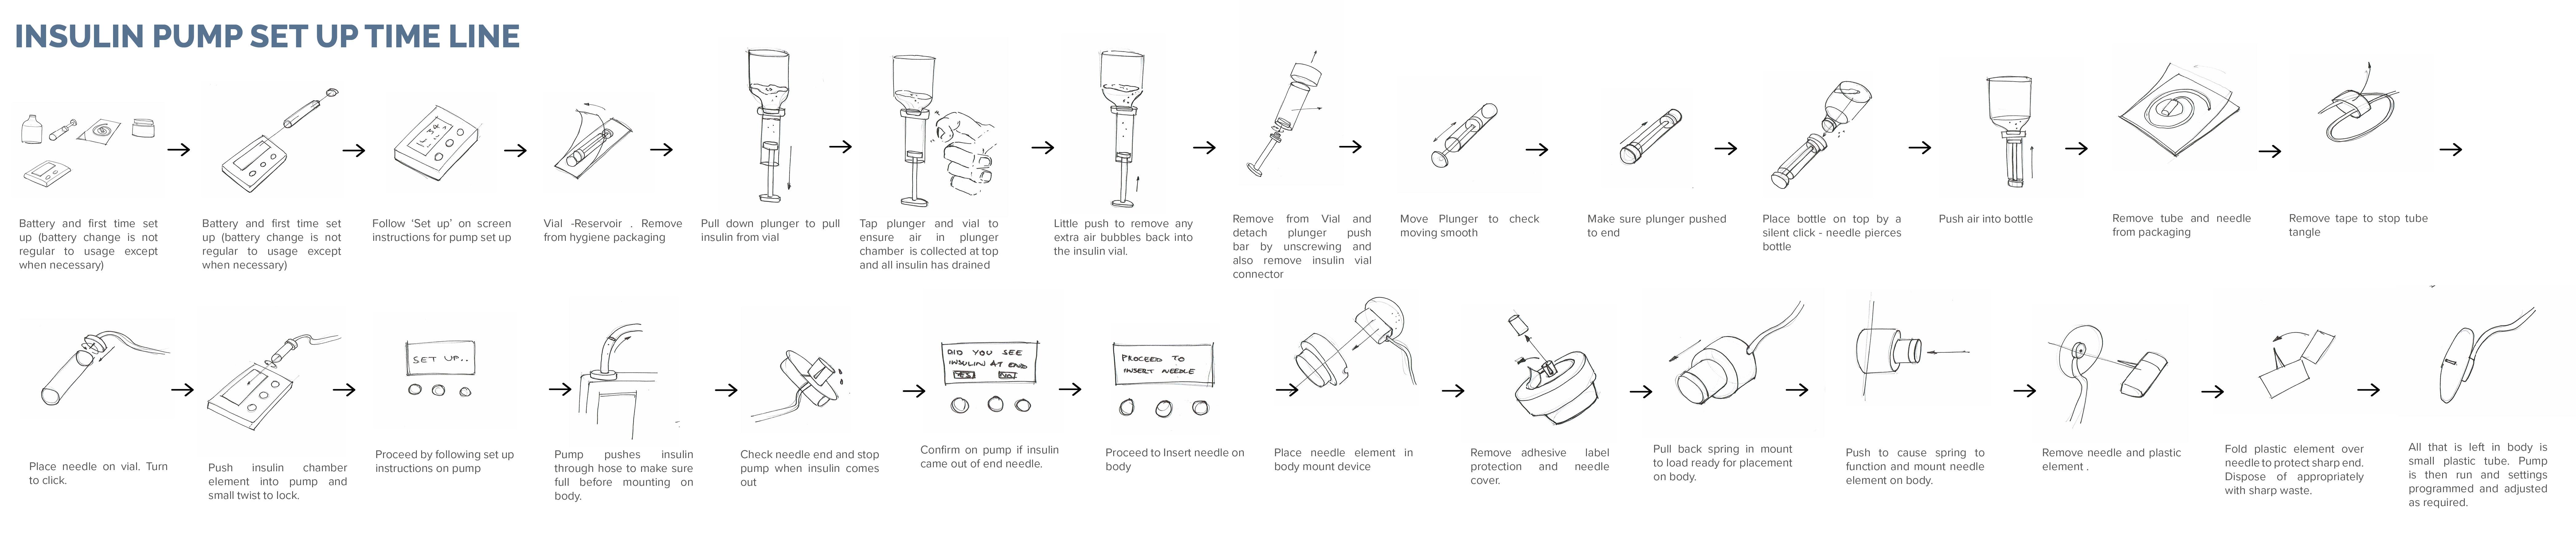 Timeline Existing  Insulin Pumps